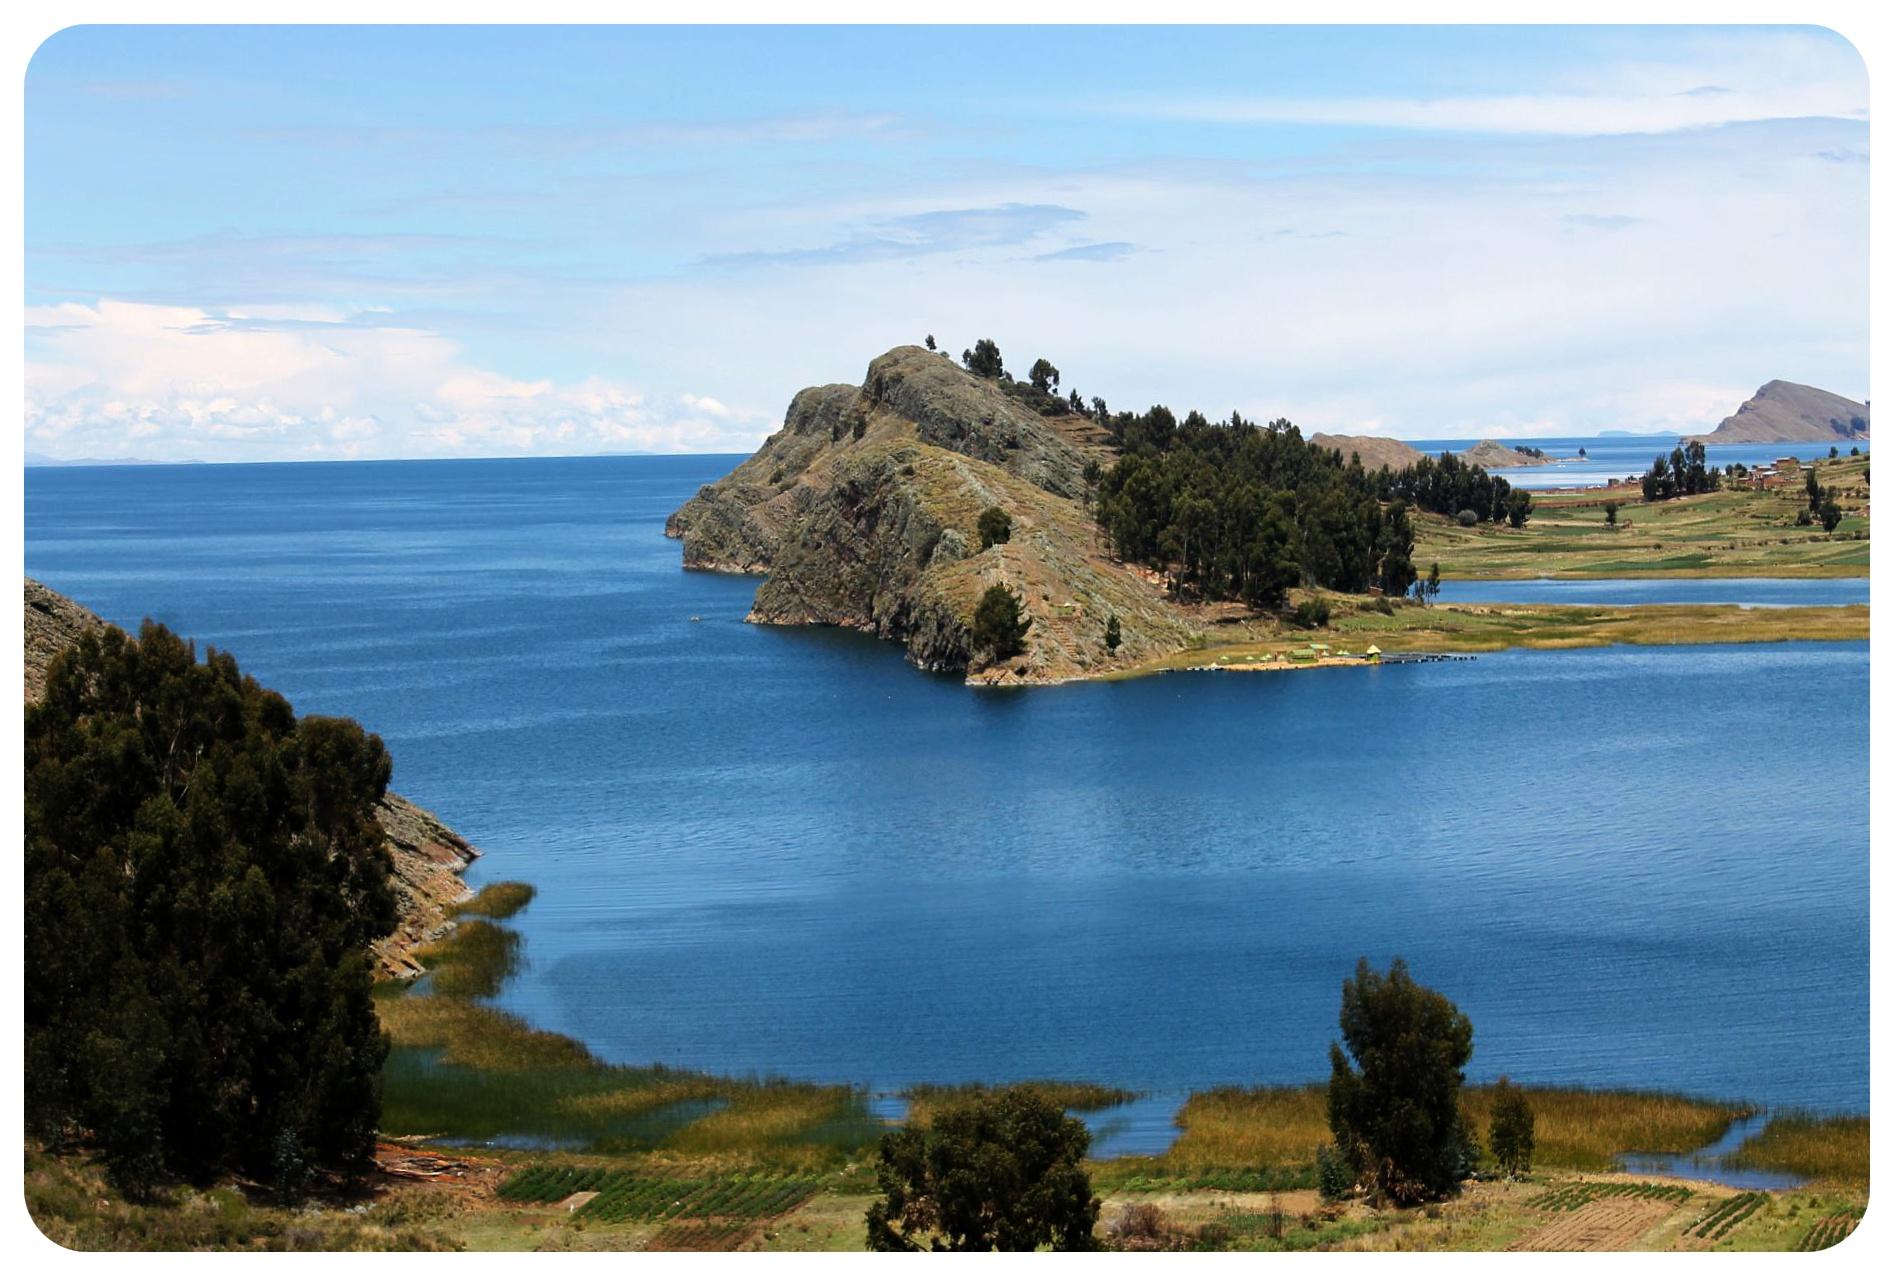 lake titicaca blue waters